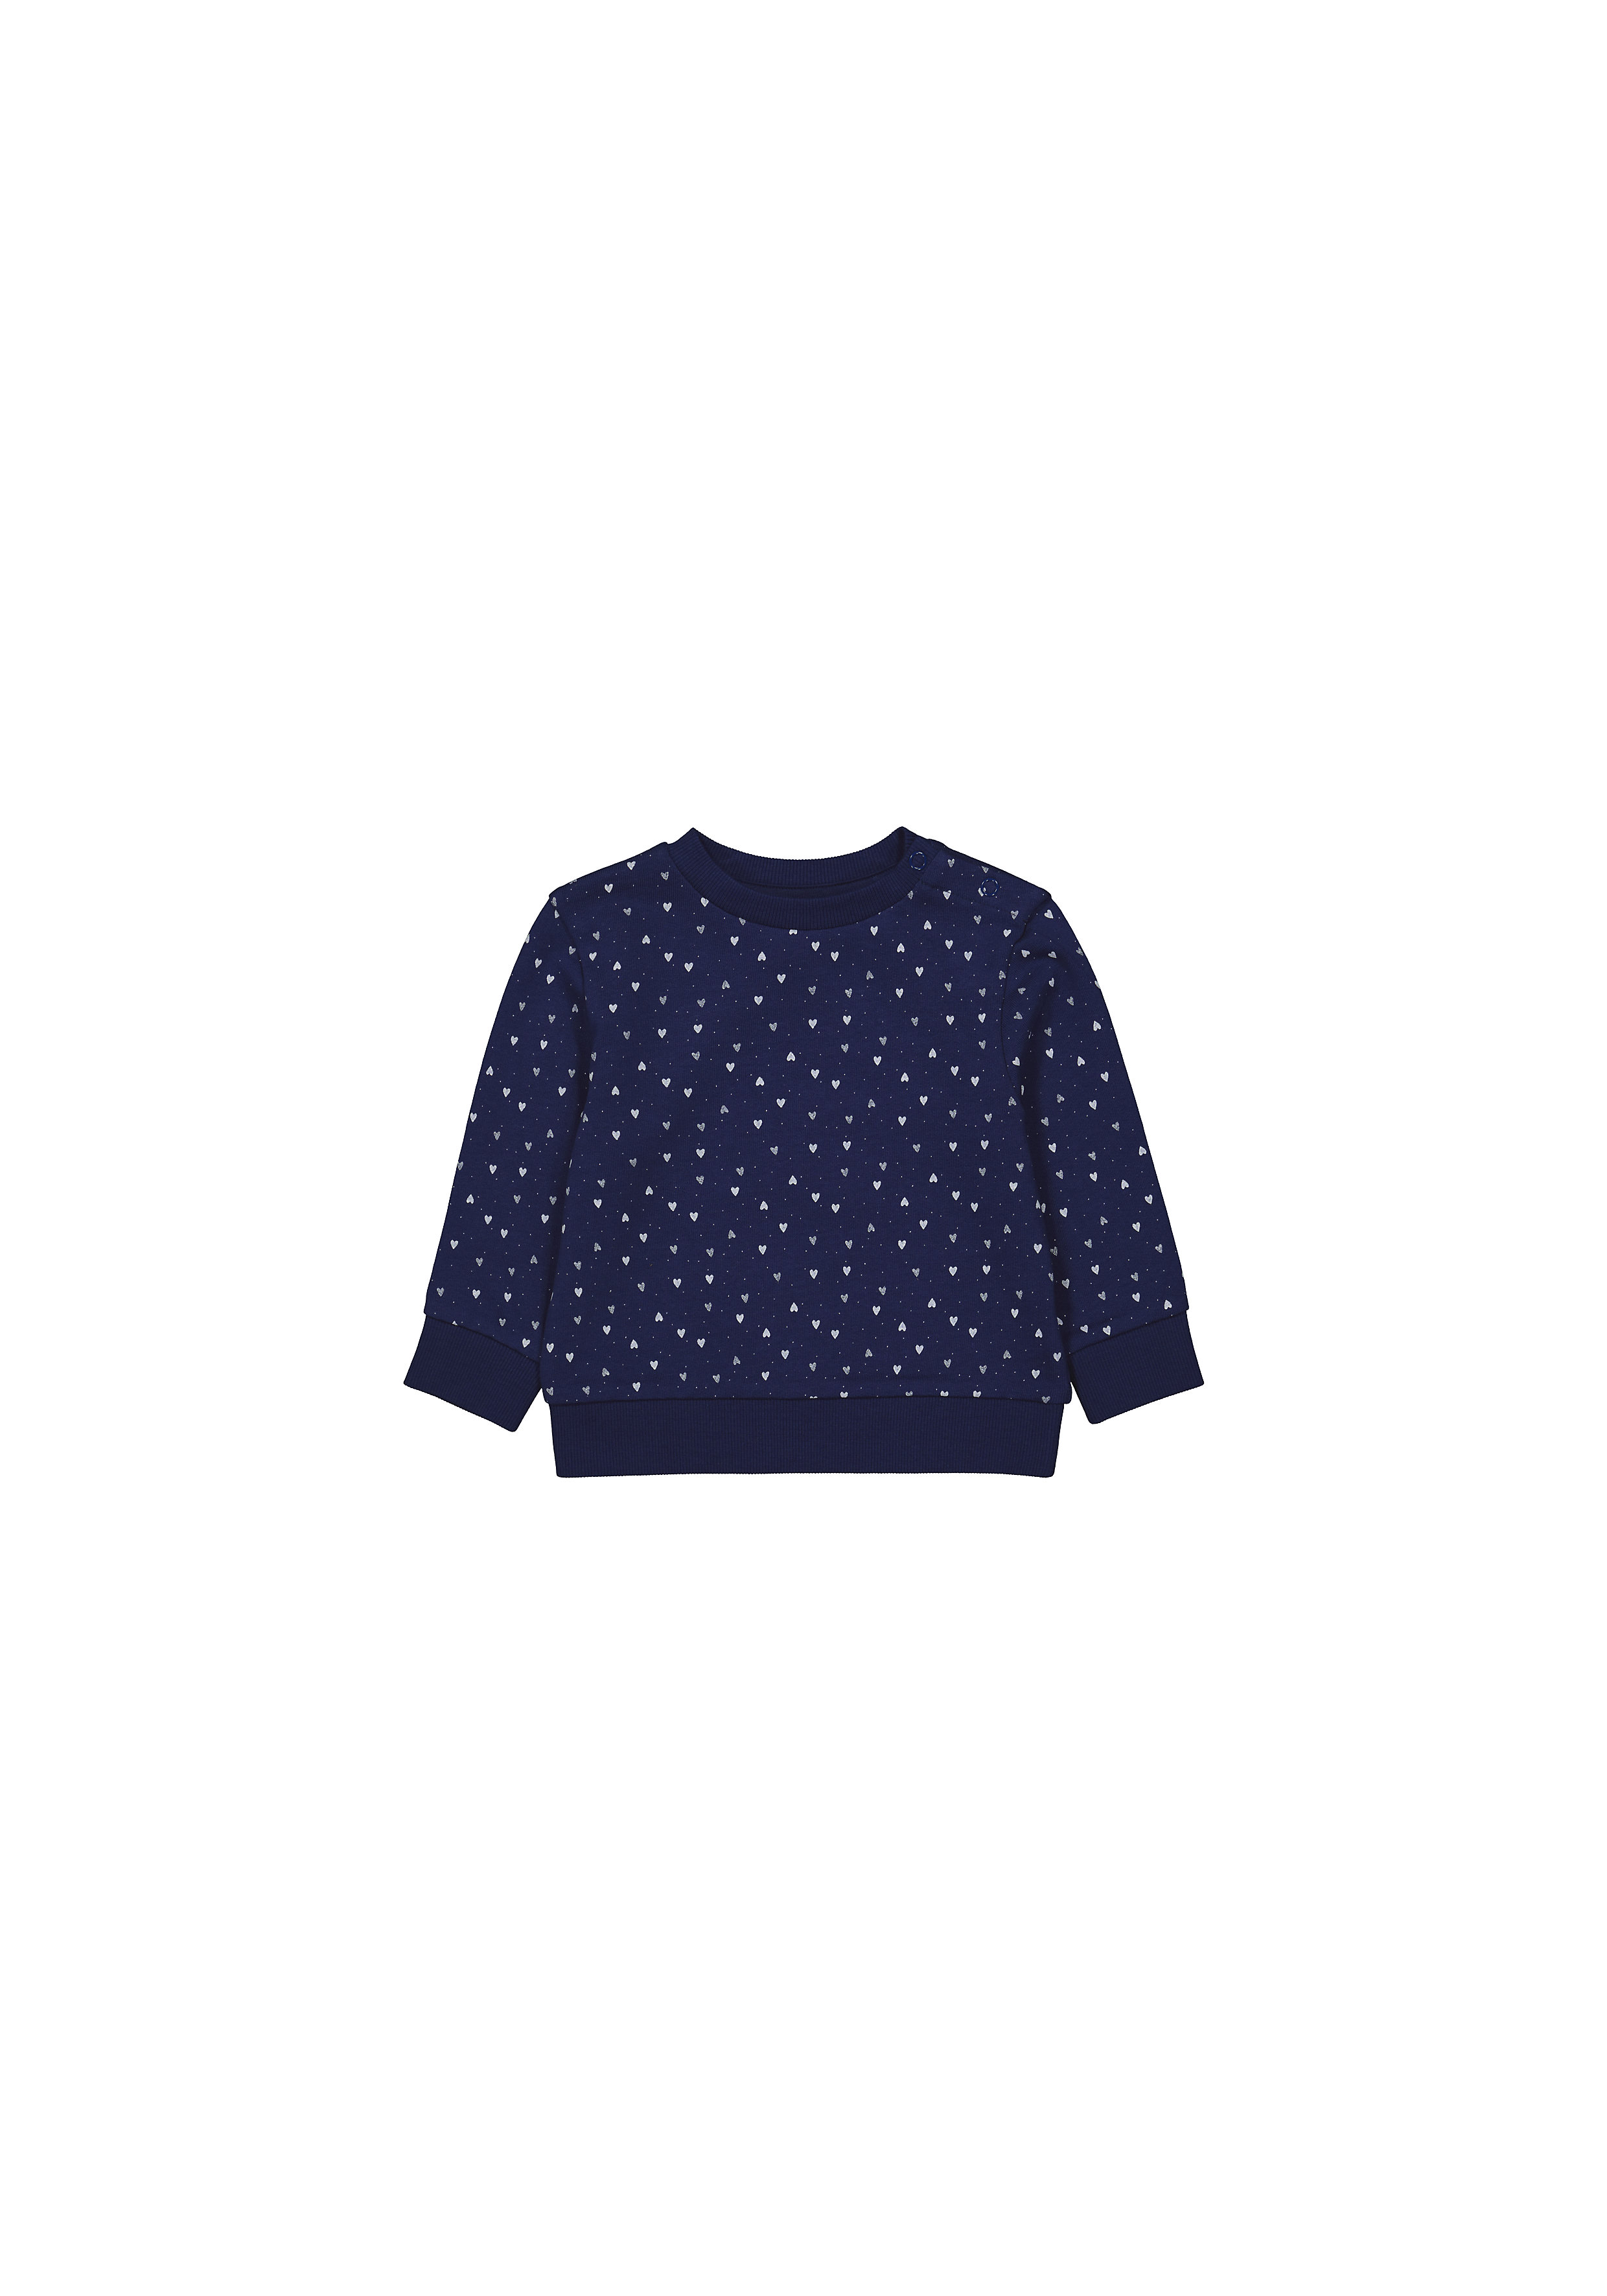 Mothercare | Girls Full Sleeves Sweatshirts  - Navy